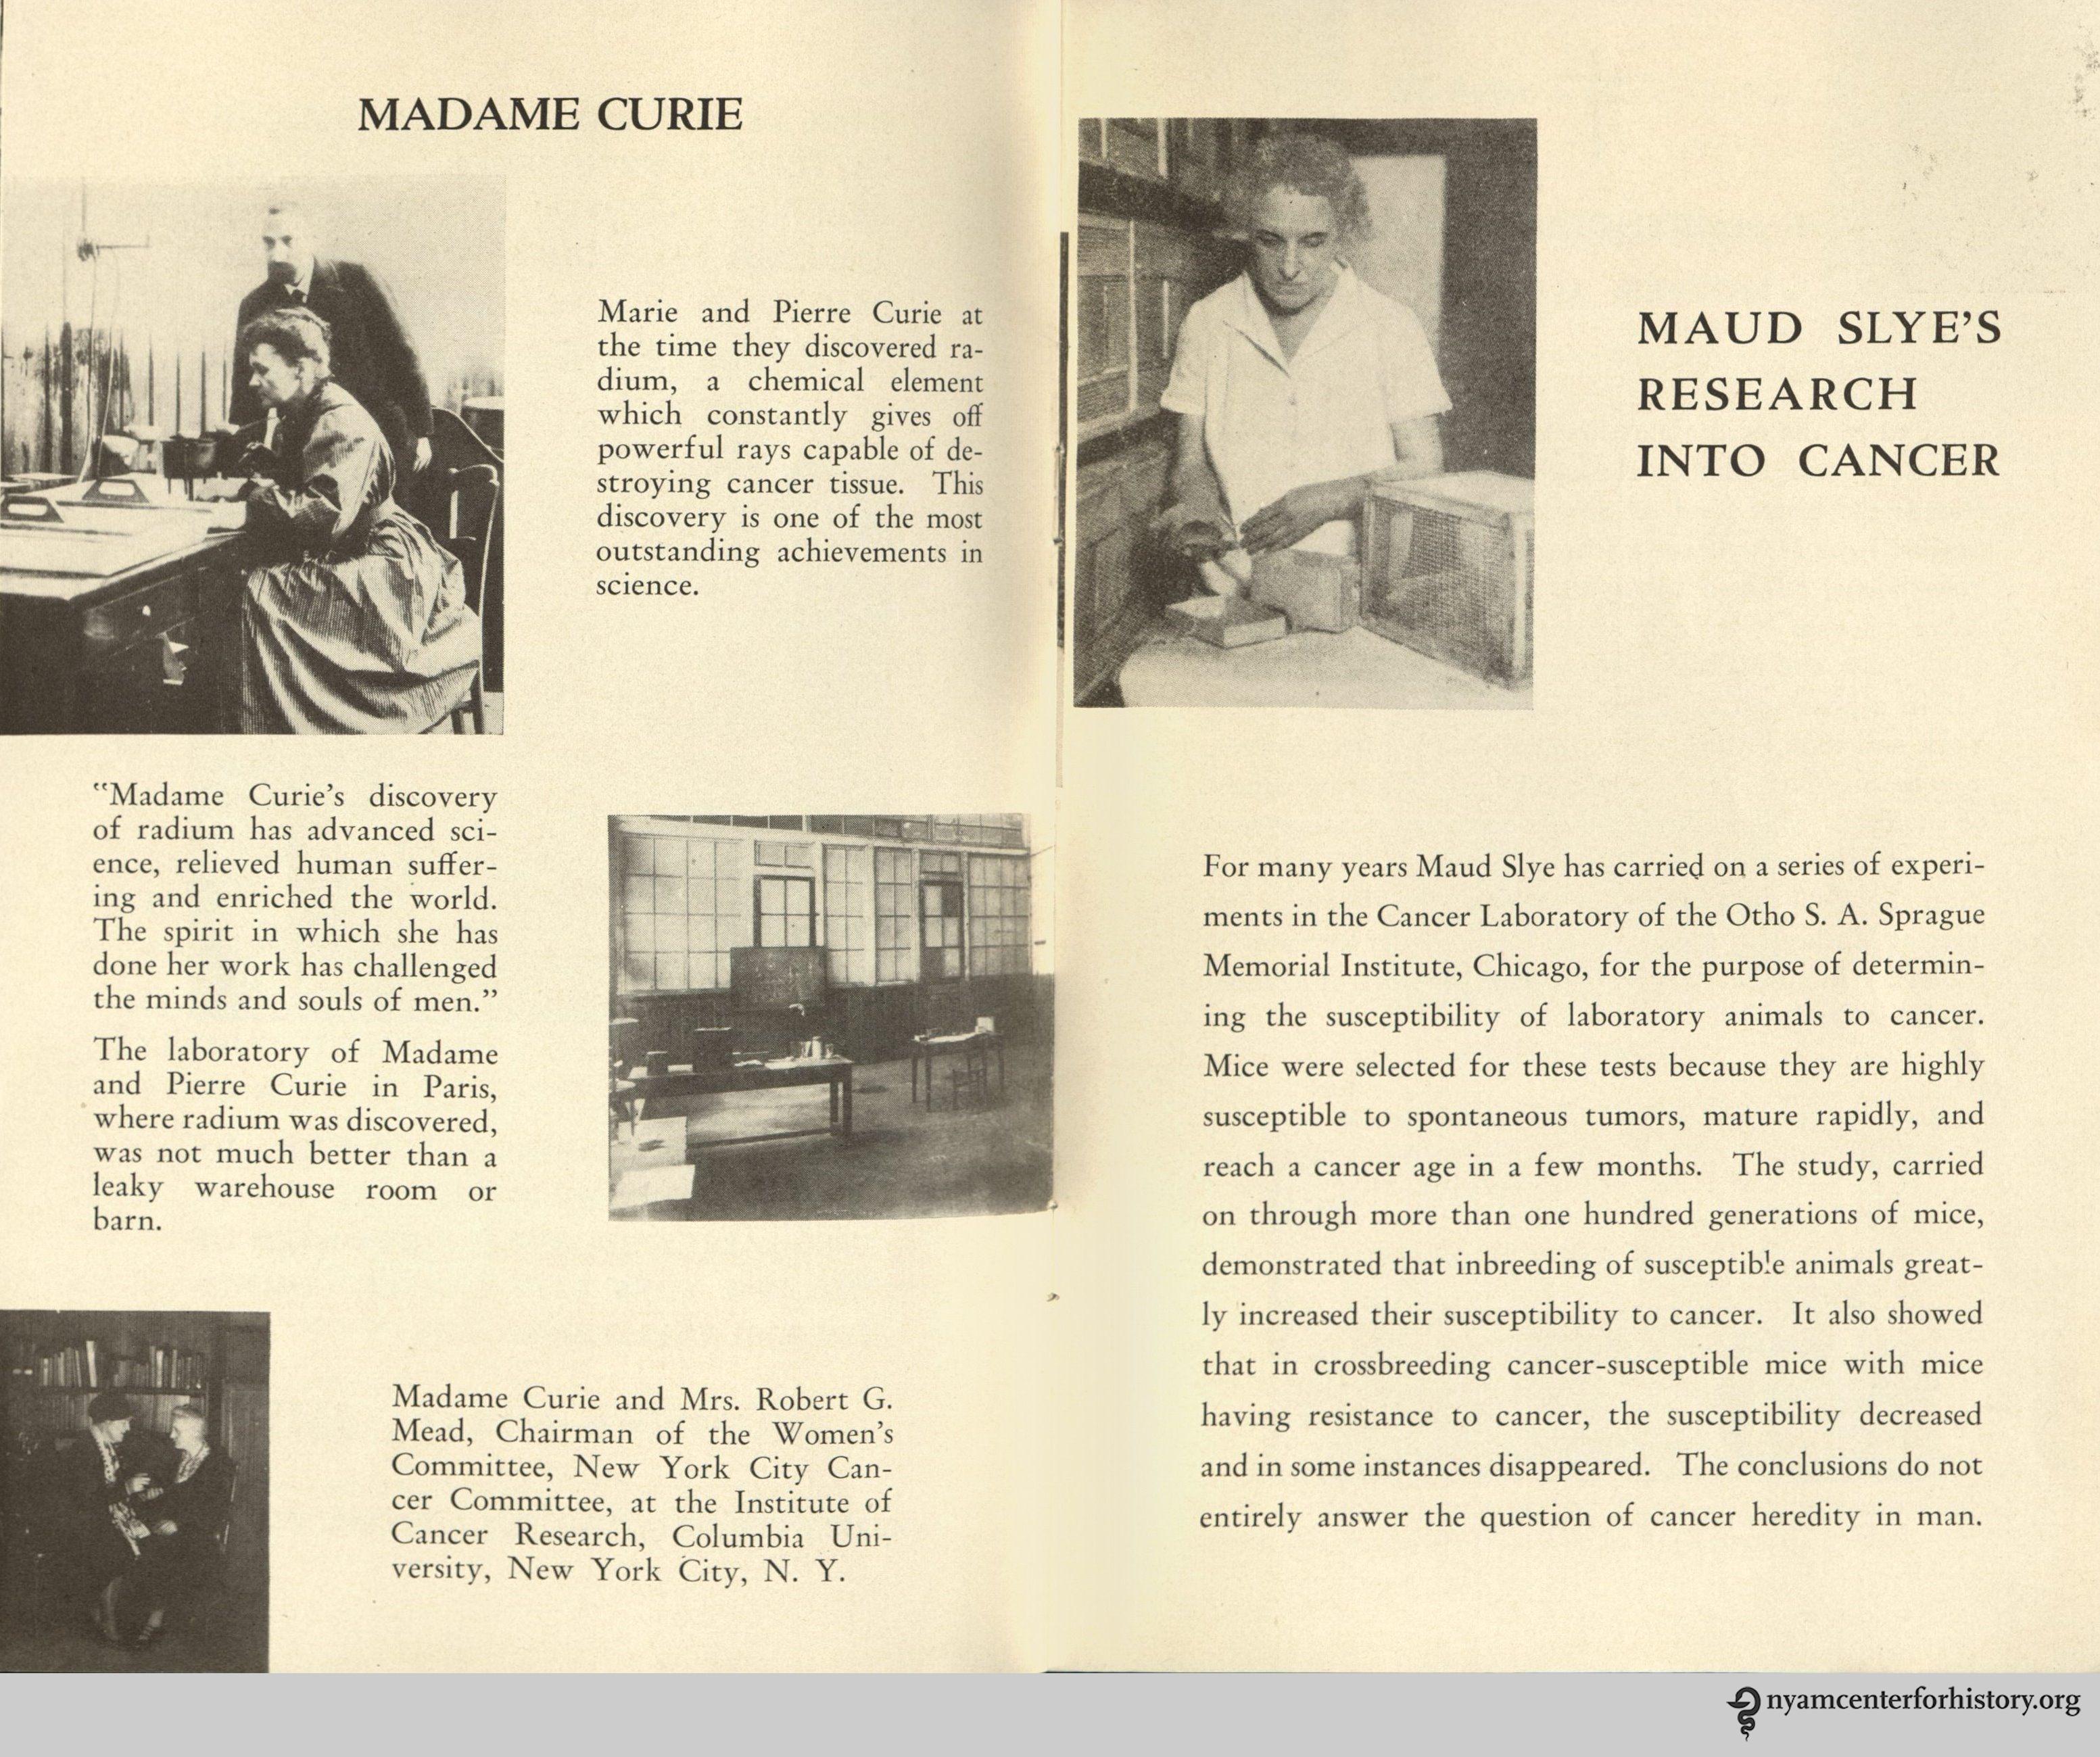 NYCCC_ForAllWomen_1936_MadameCurieMaudSlye_watermark